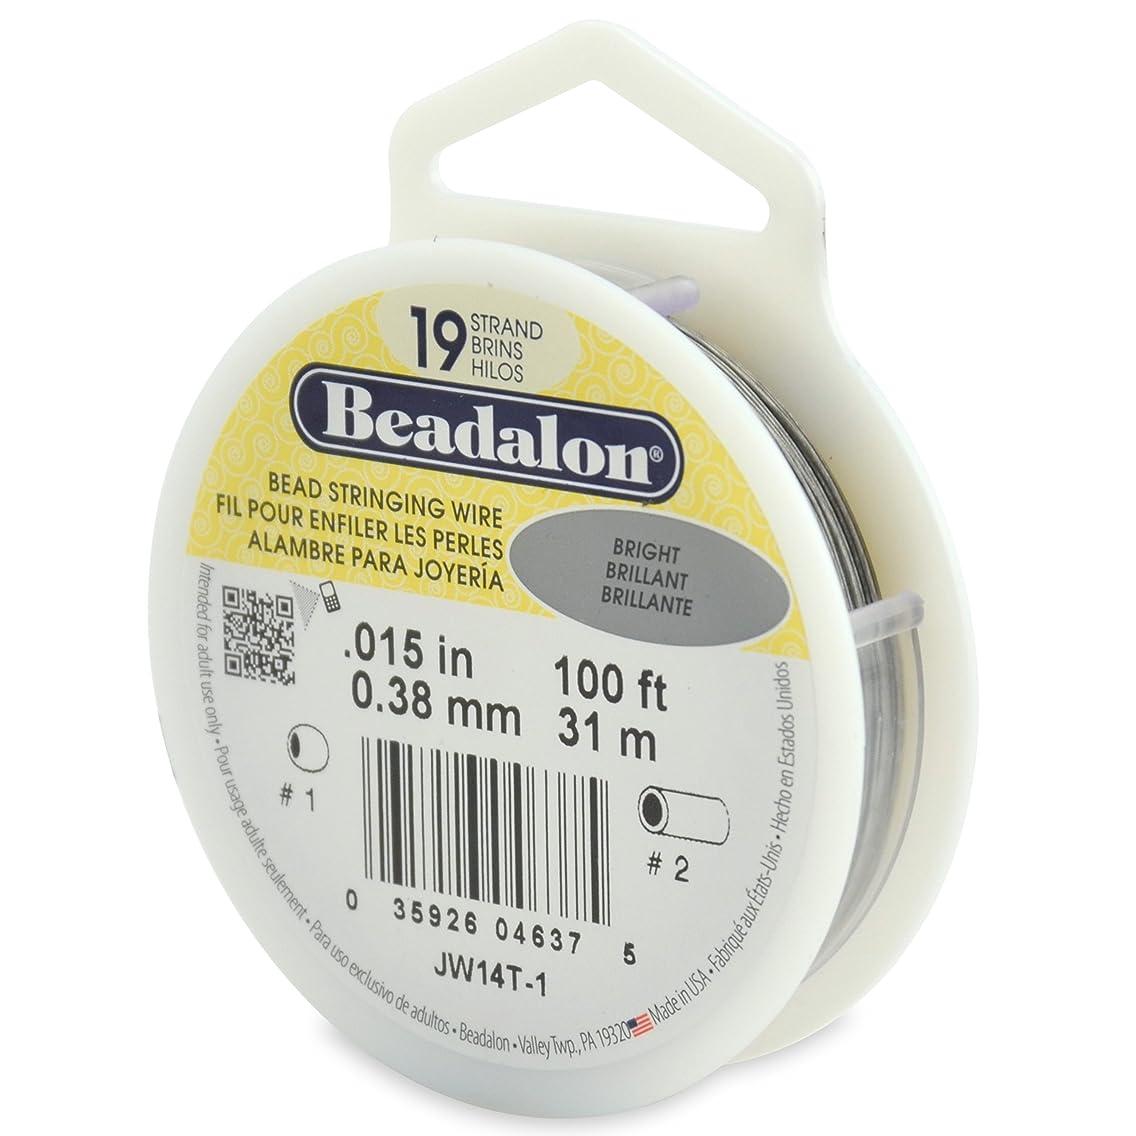 Beadalon 19-Strand Bead Stringing Wire, 0.015-Inch, Bright, 100-Feet